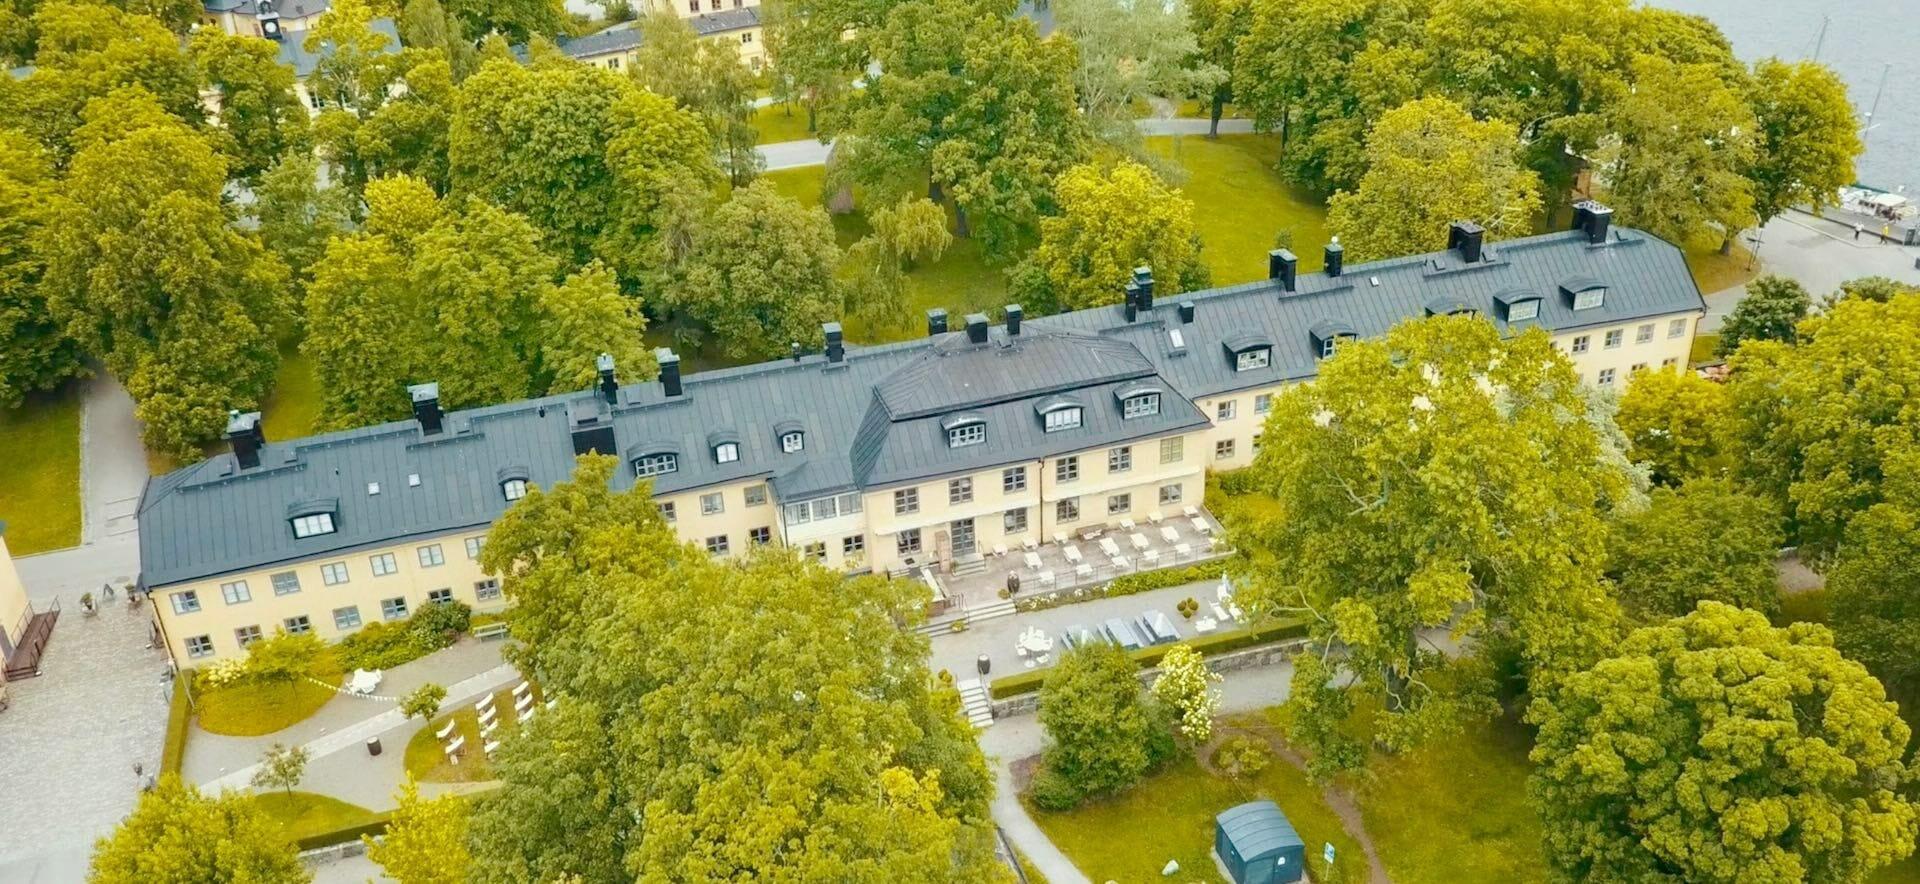 Sheppsholmen hotel stockholm